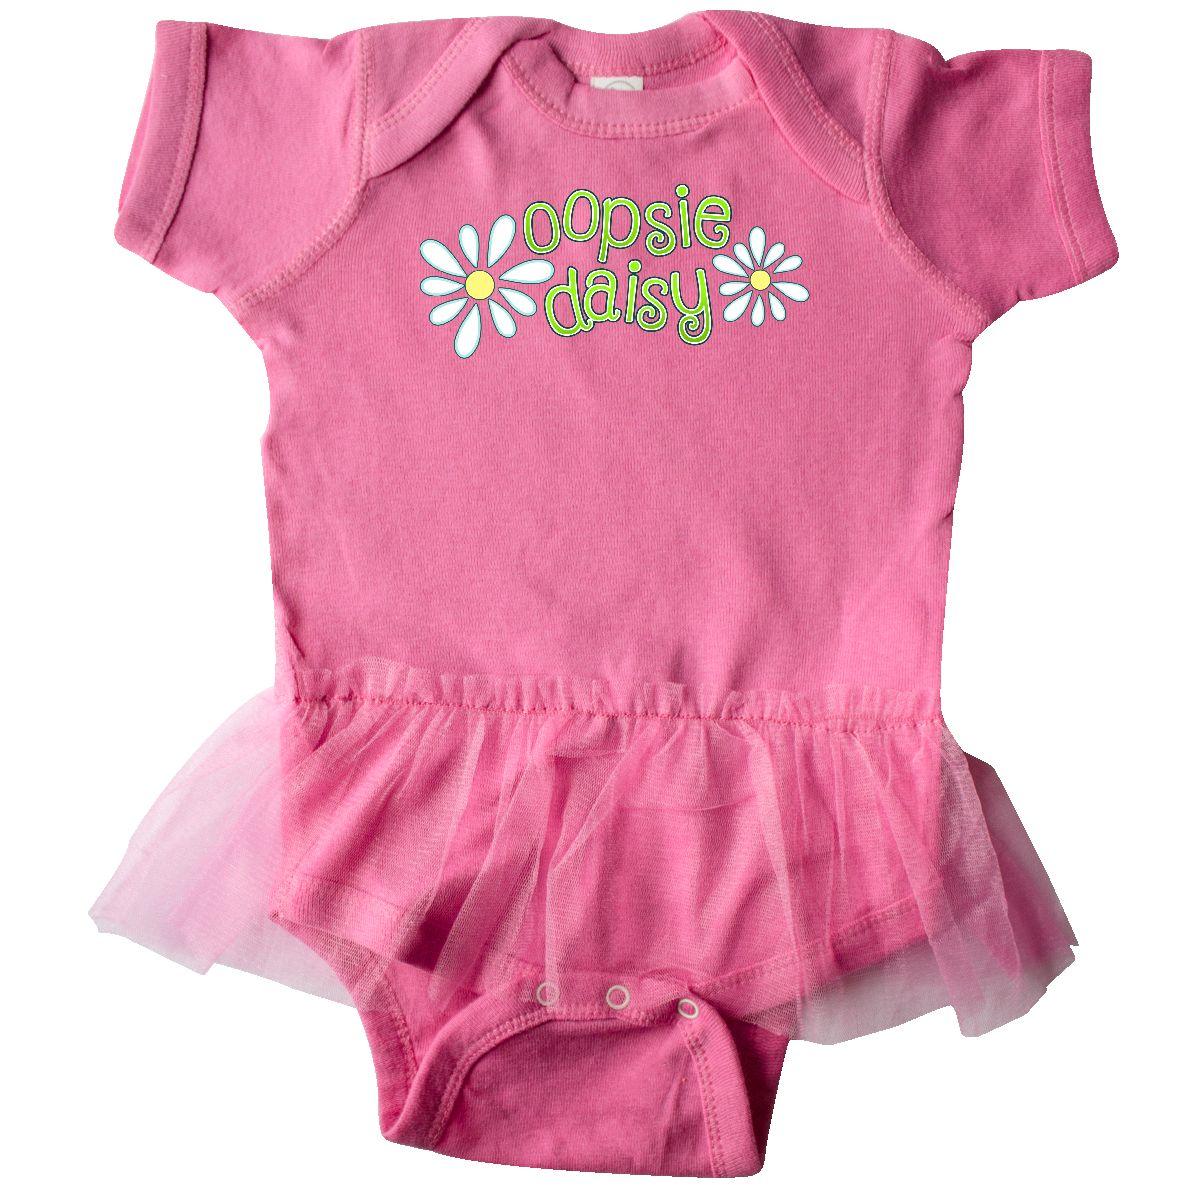 Inktastic Oopsie Daisy Infant Tutu Bodysuit Baby Little Learning